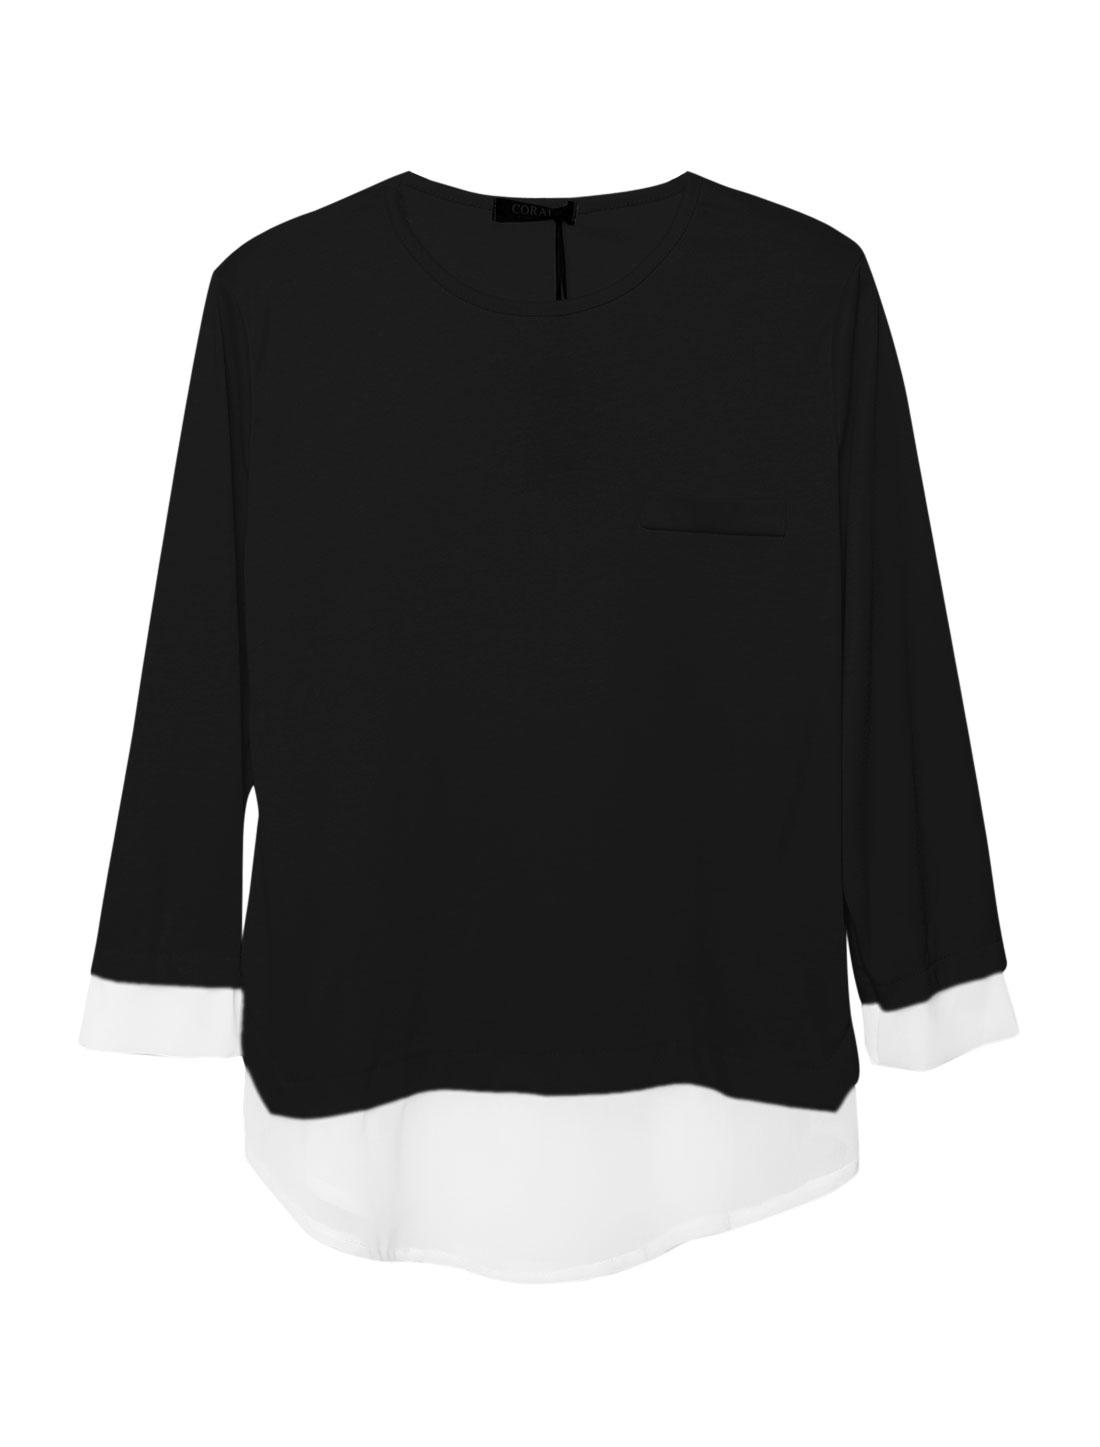 Woman Long Sleeves Chiffon Panel Black Tunic Shirt M